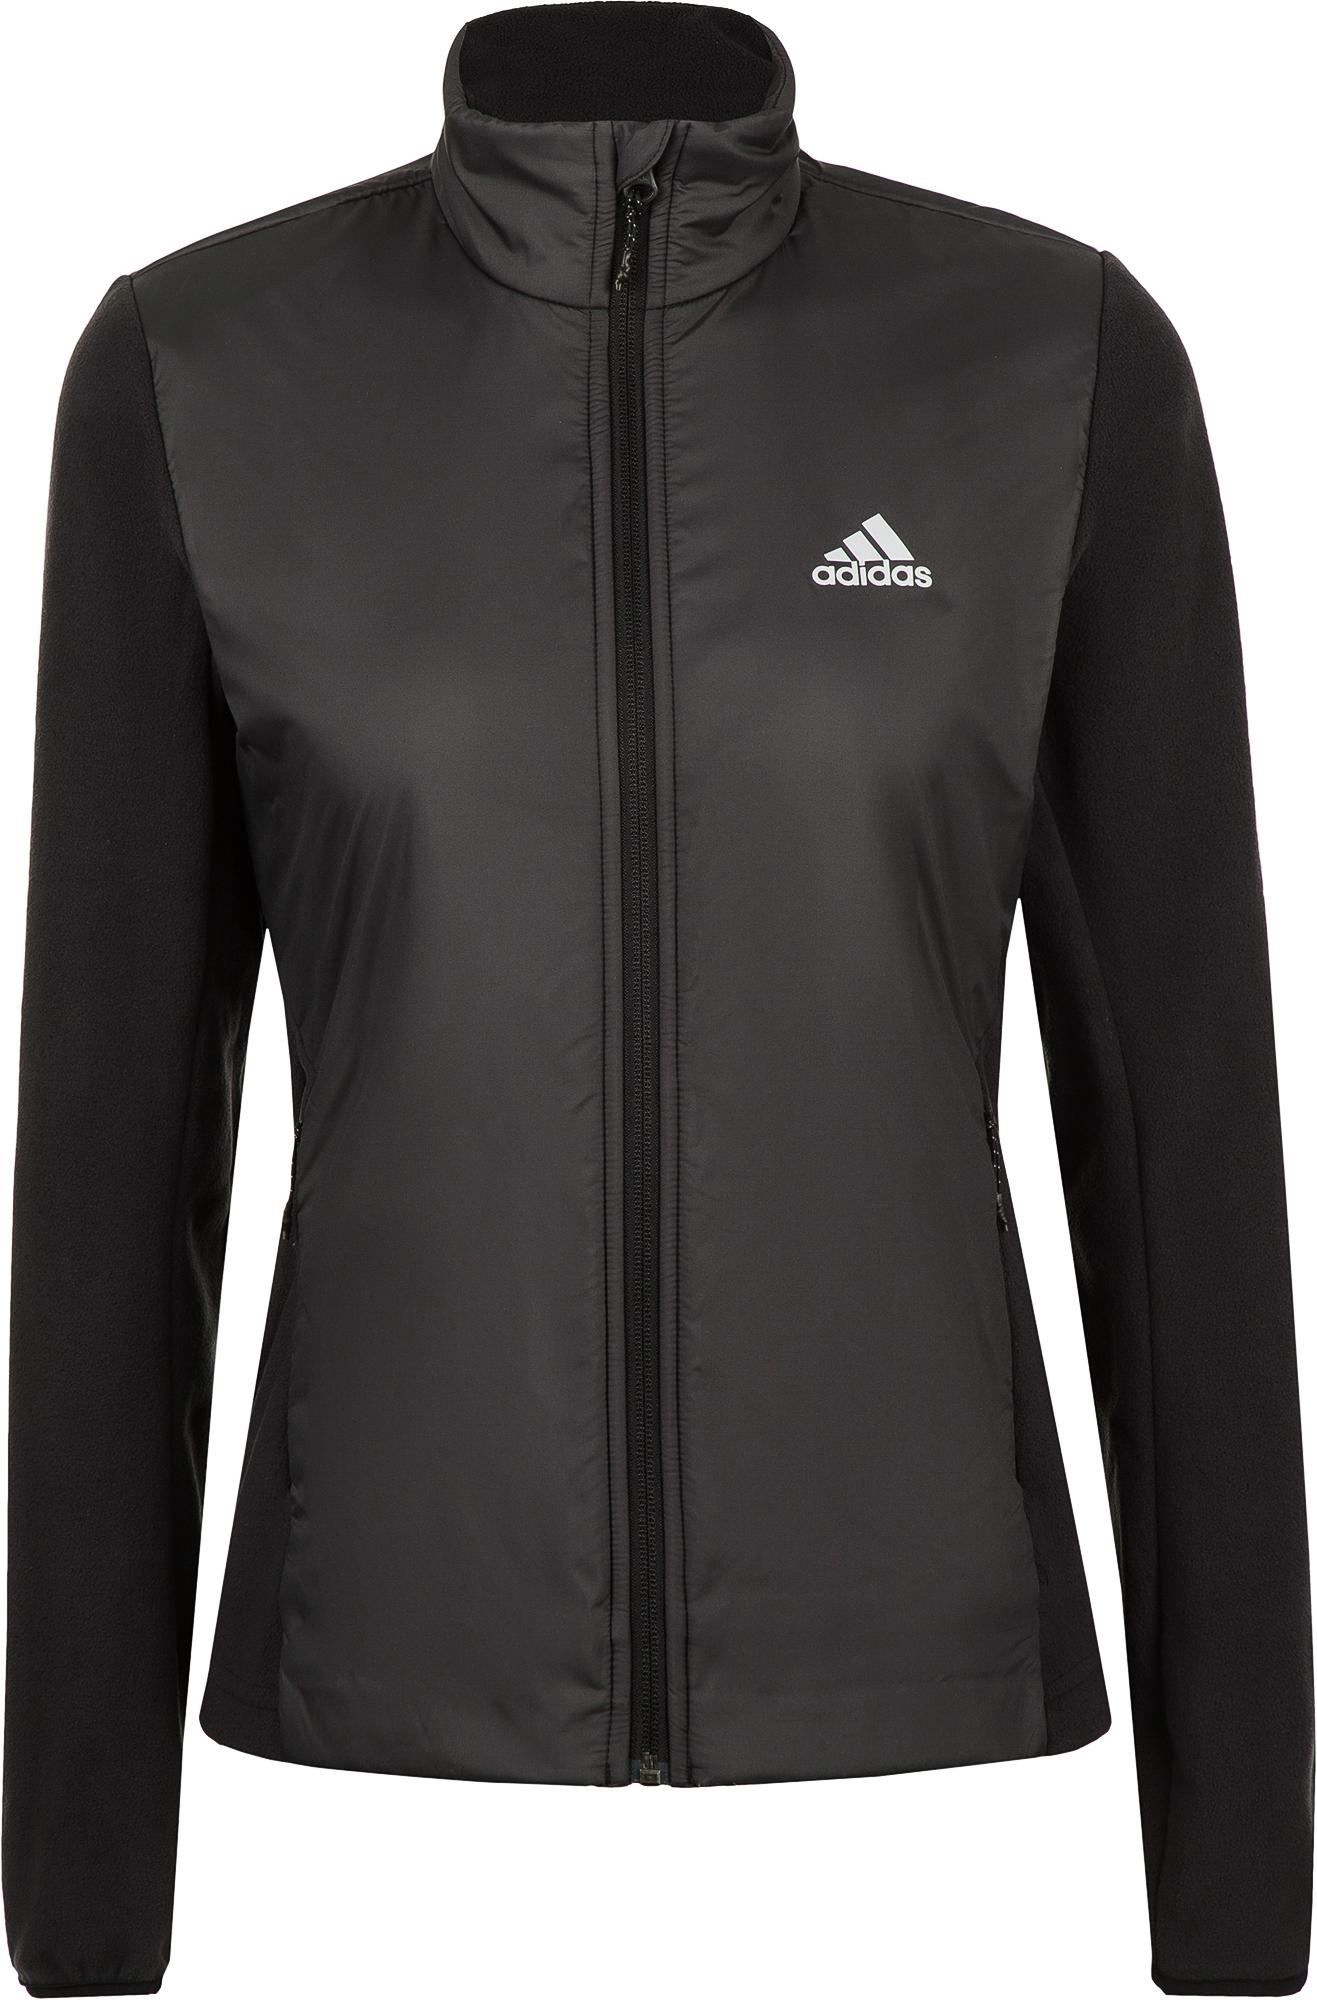 Adidas Олимпийка женская Windfleece, размер 54-56